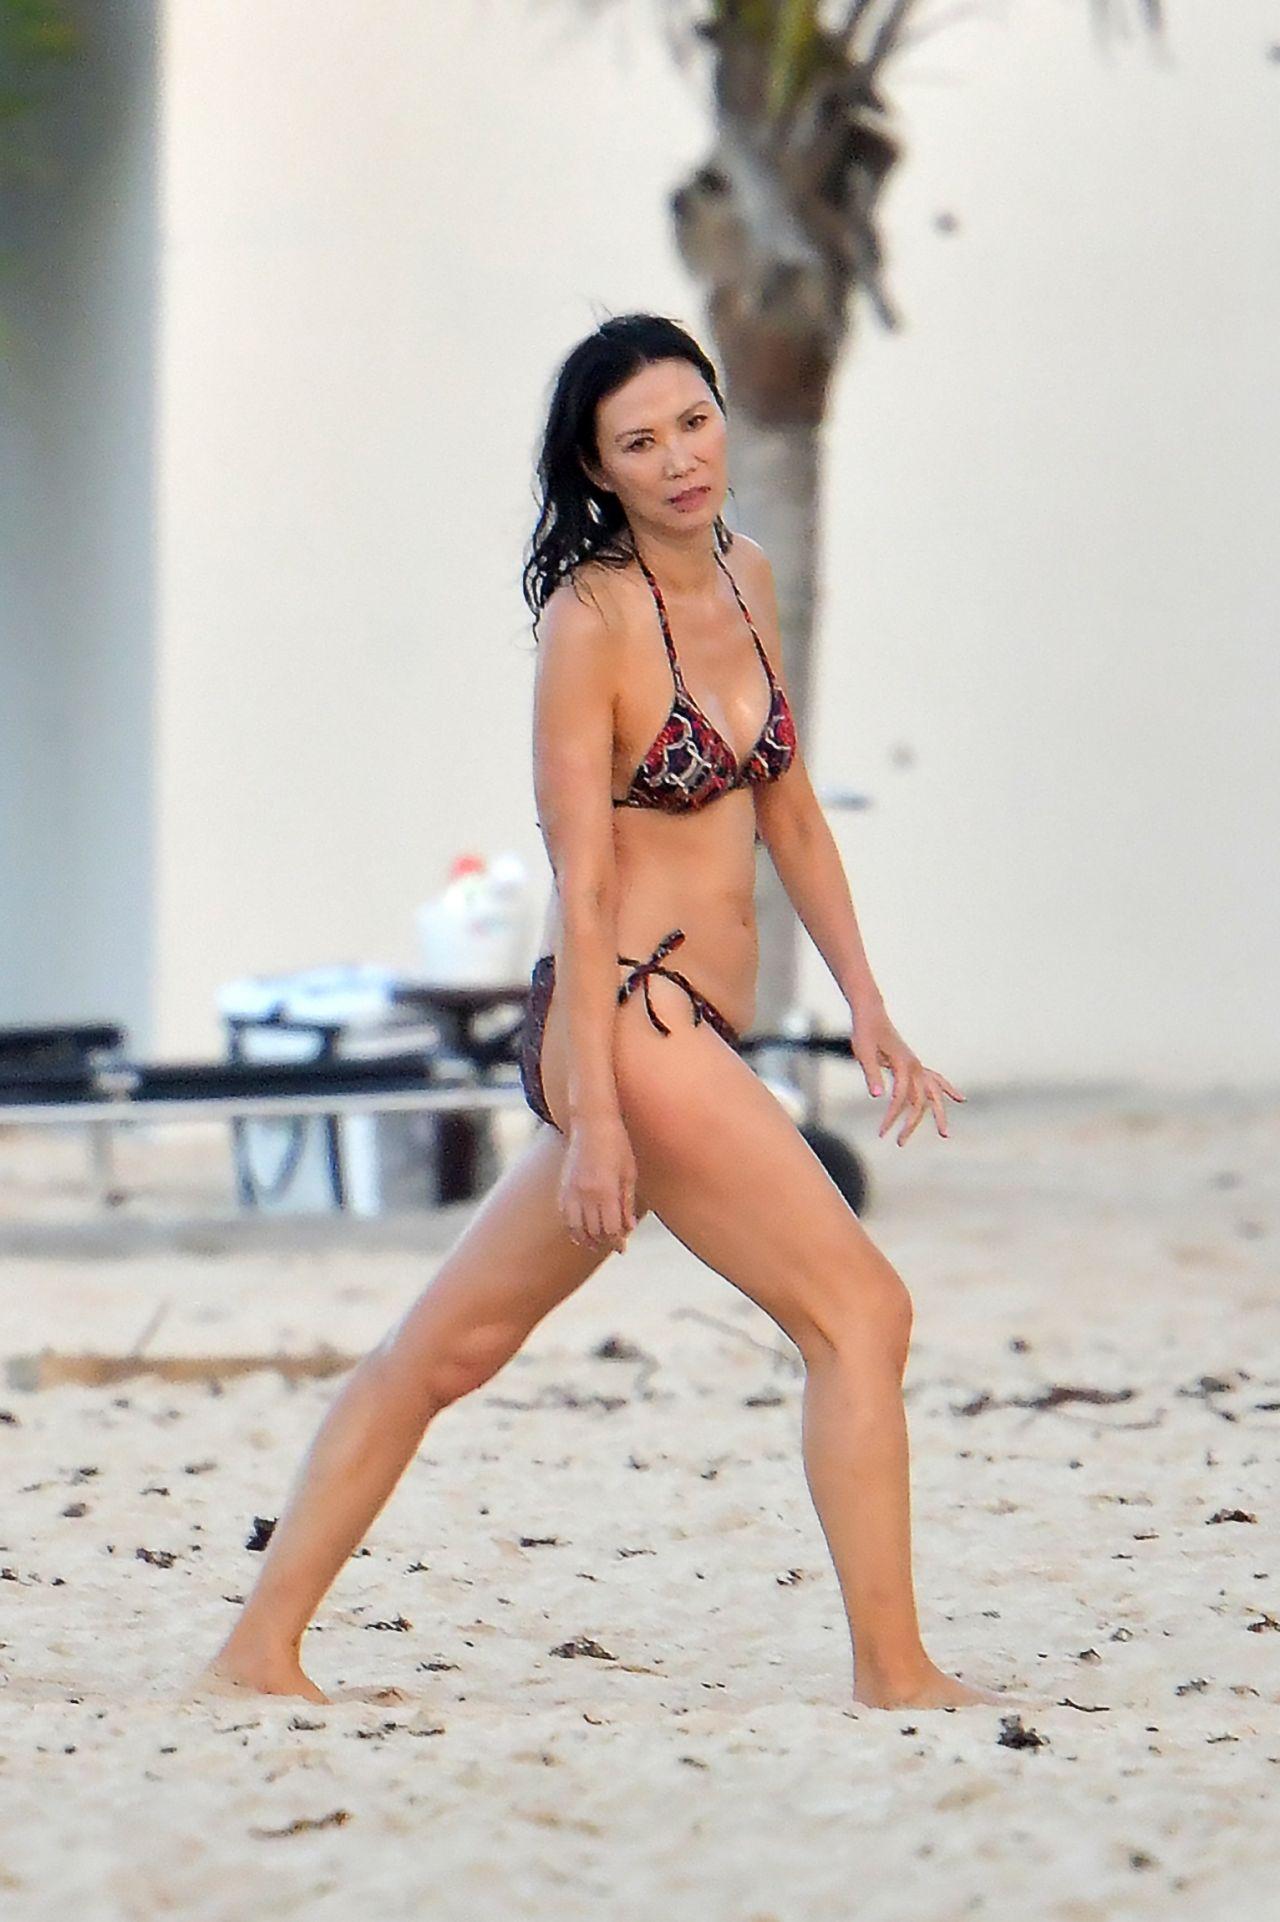 Wendi Deng Murdoch Bikini Nude Photos 79